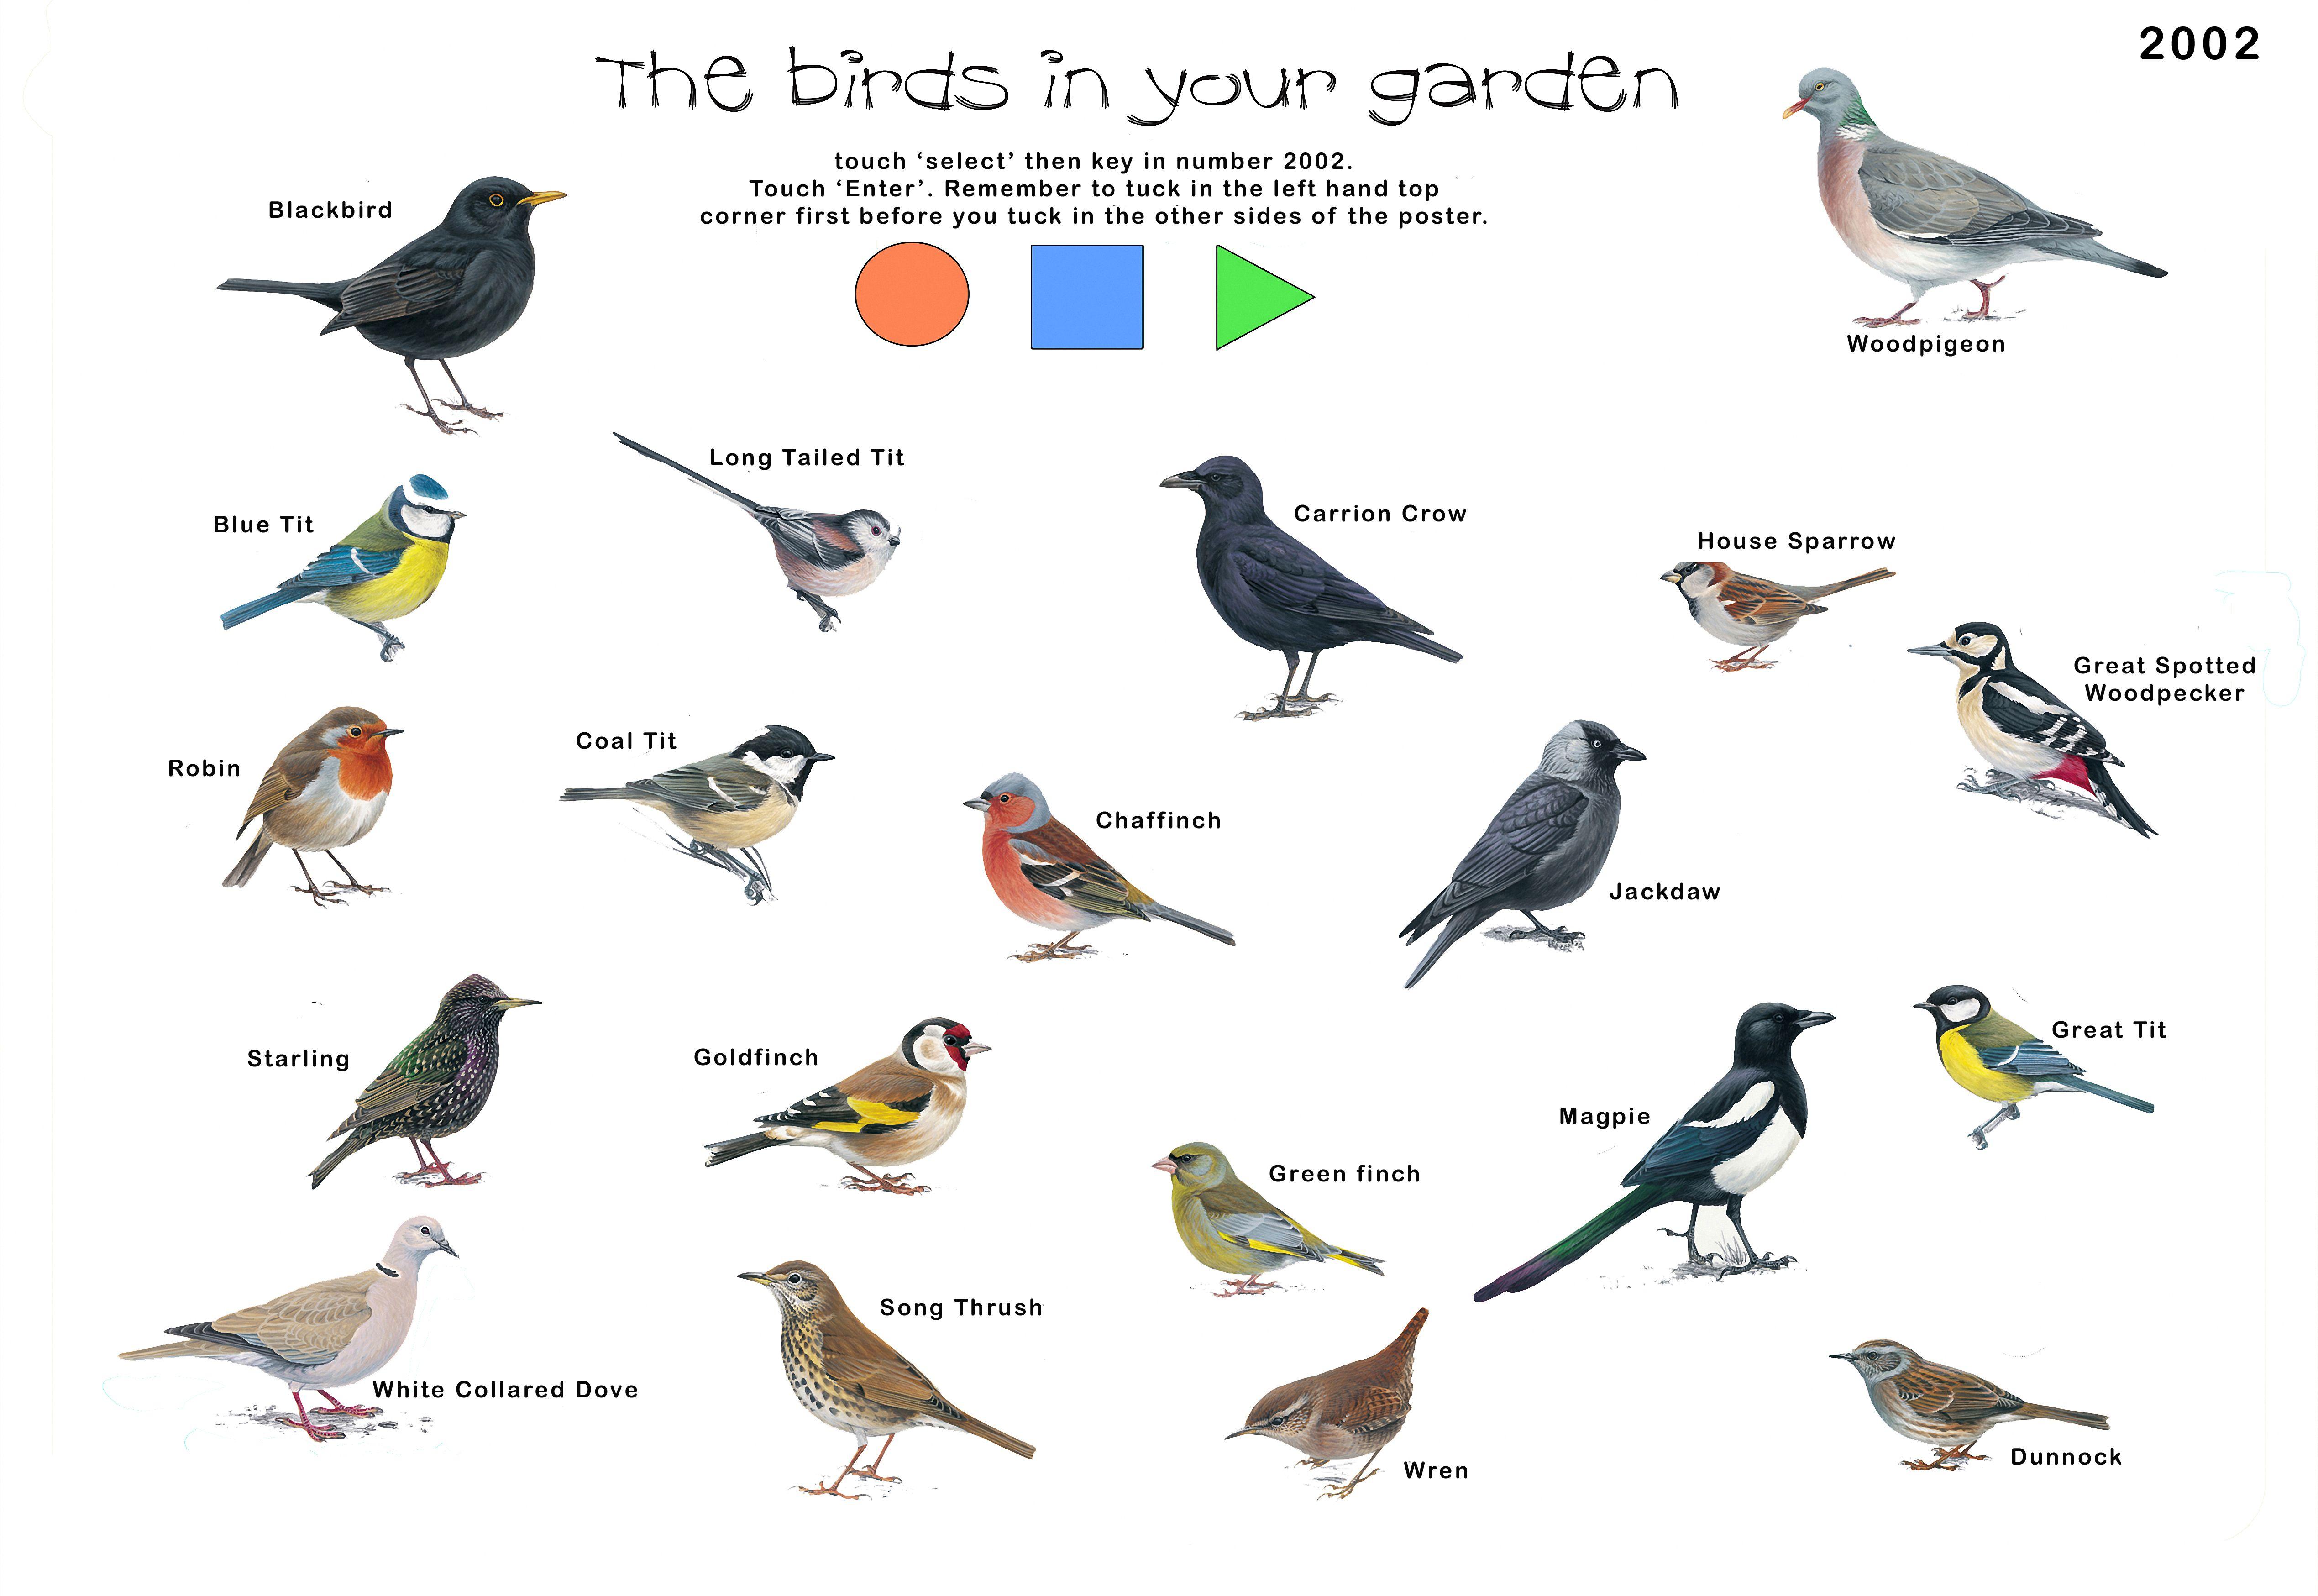 Garden Birds Copy 0 Jpg 5078 3496 British Birds Identification Bird Identification Bird